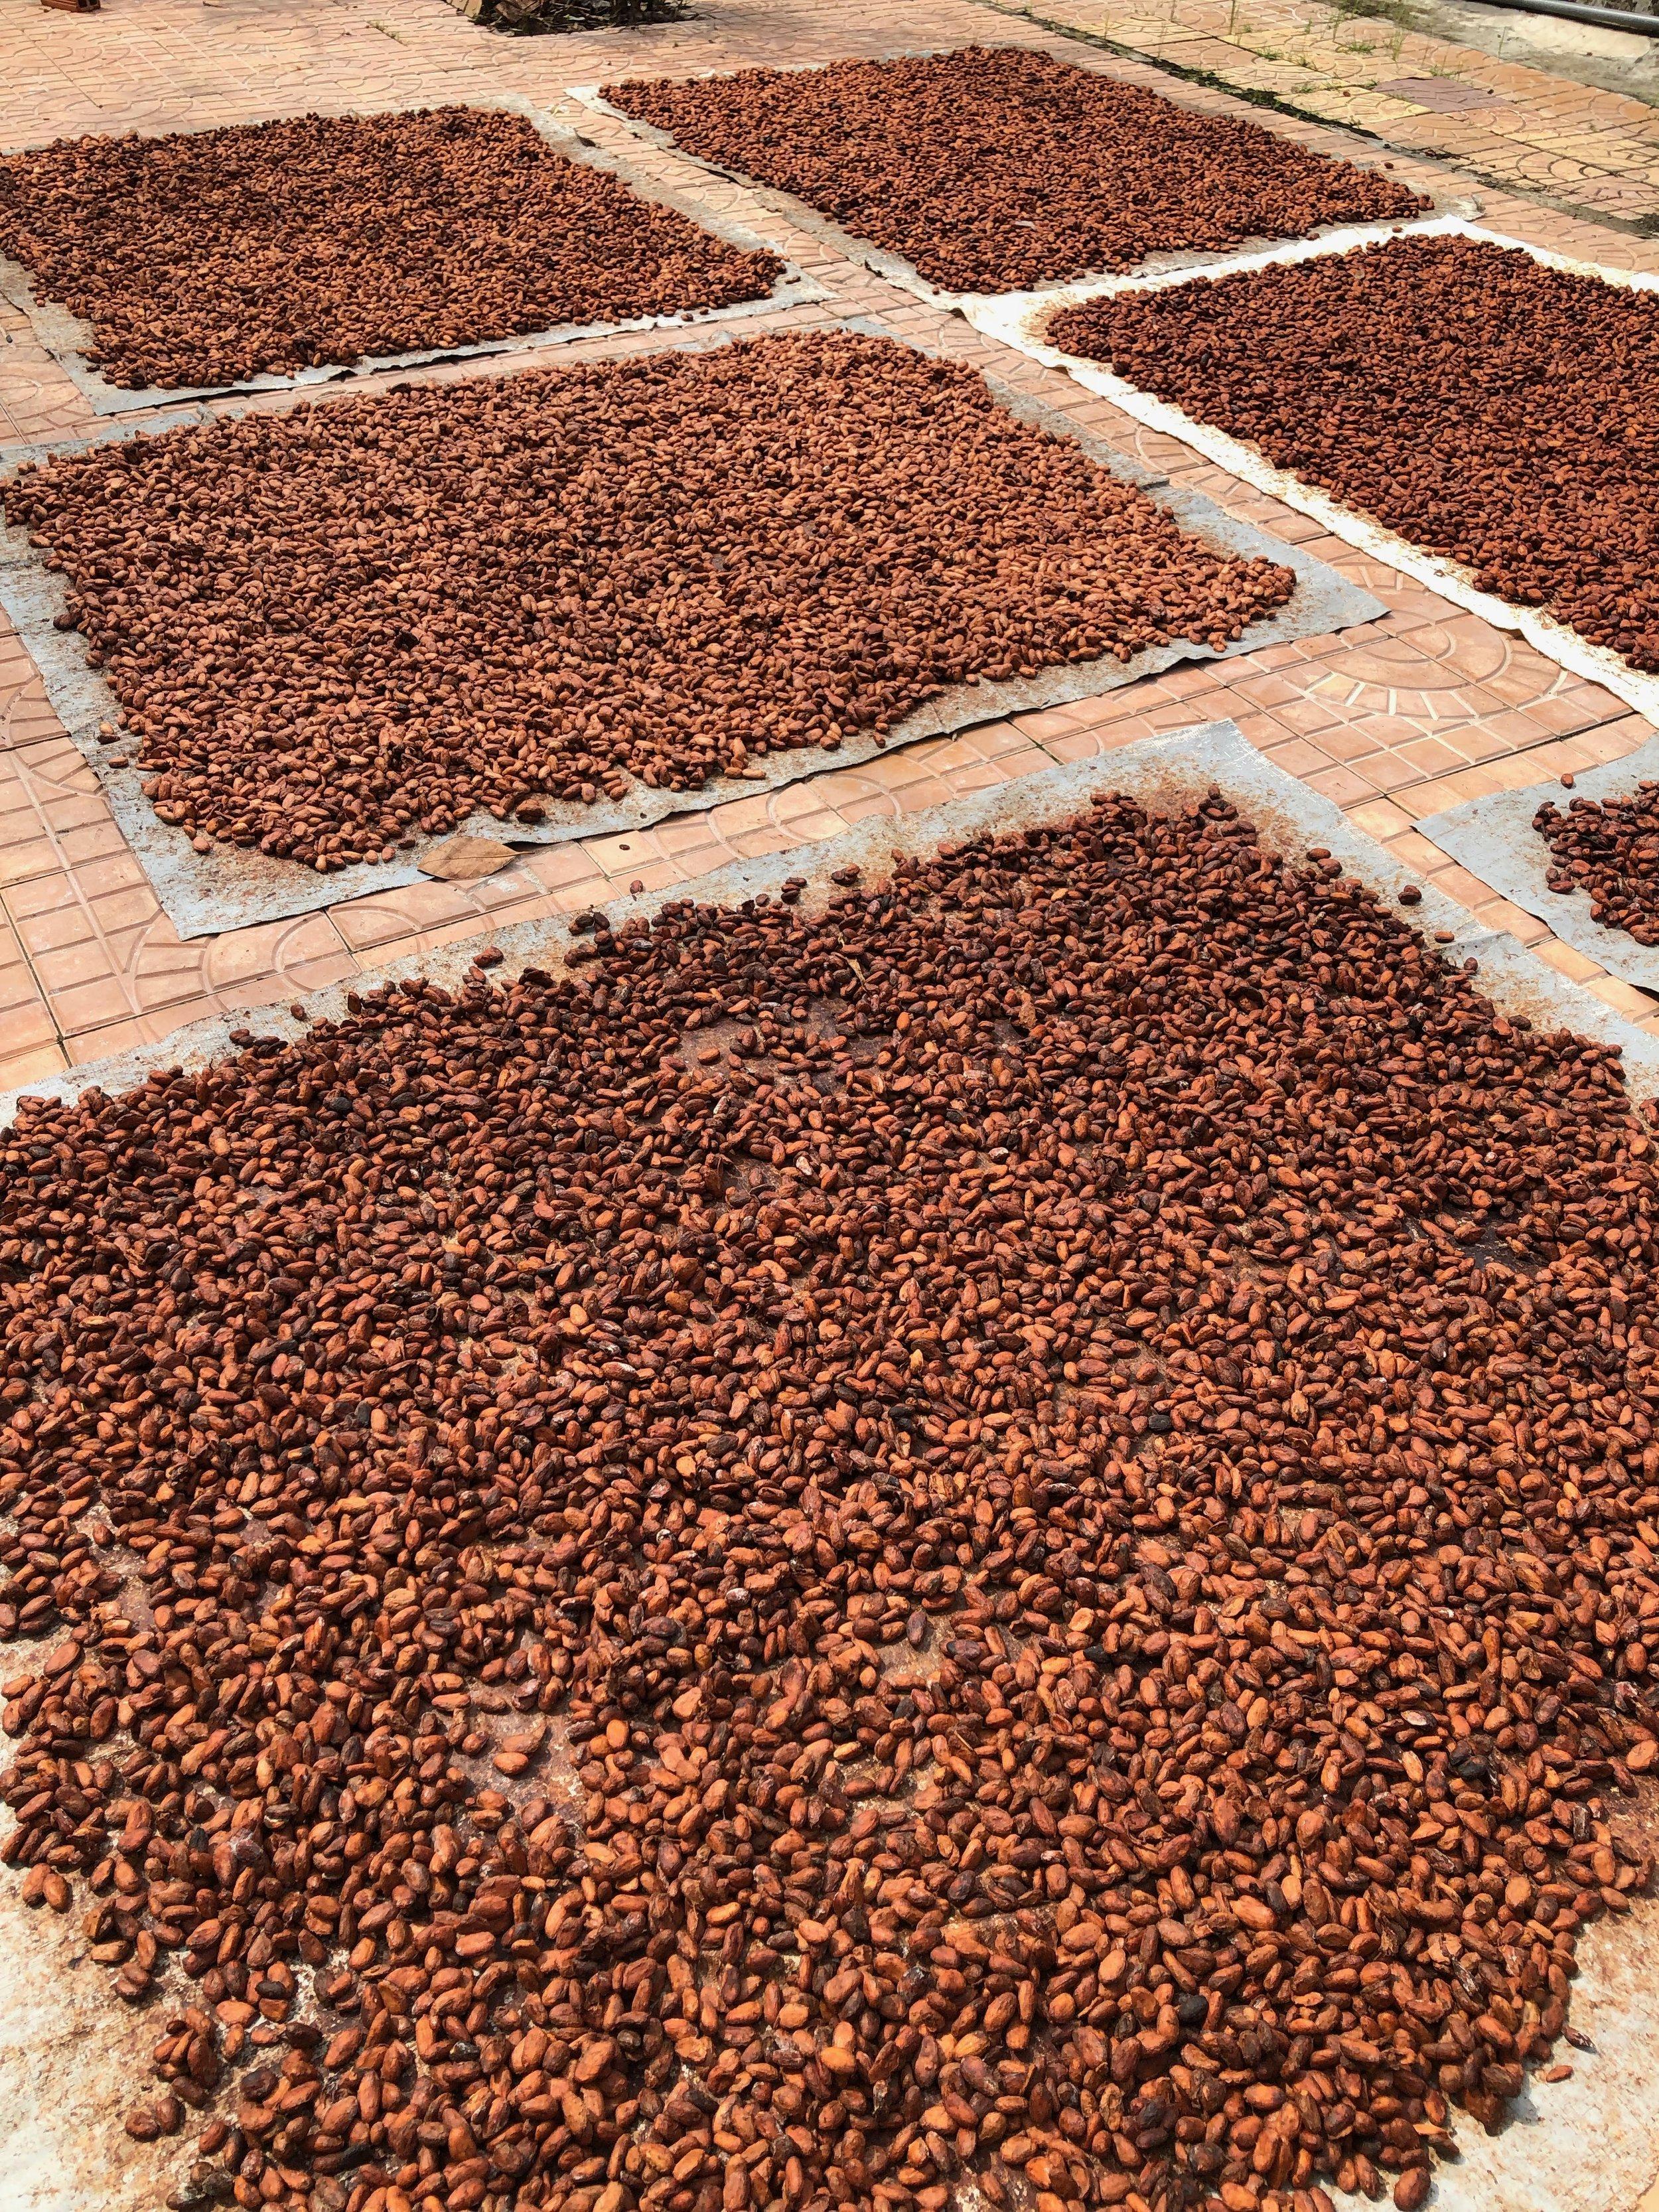 Cacao farm